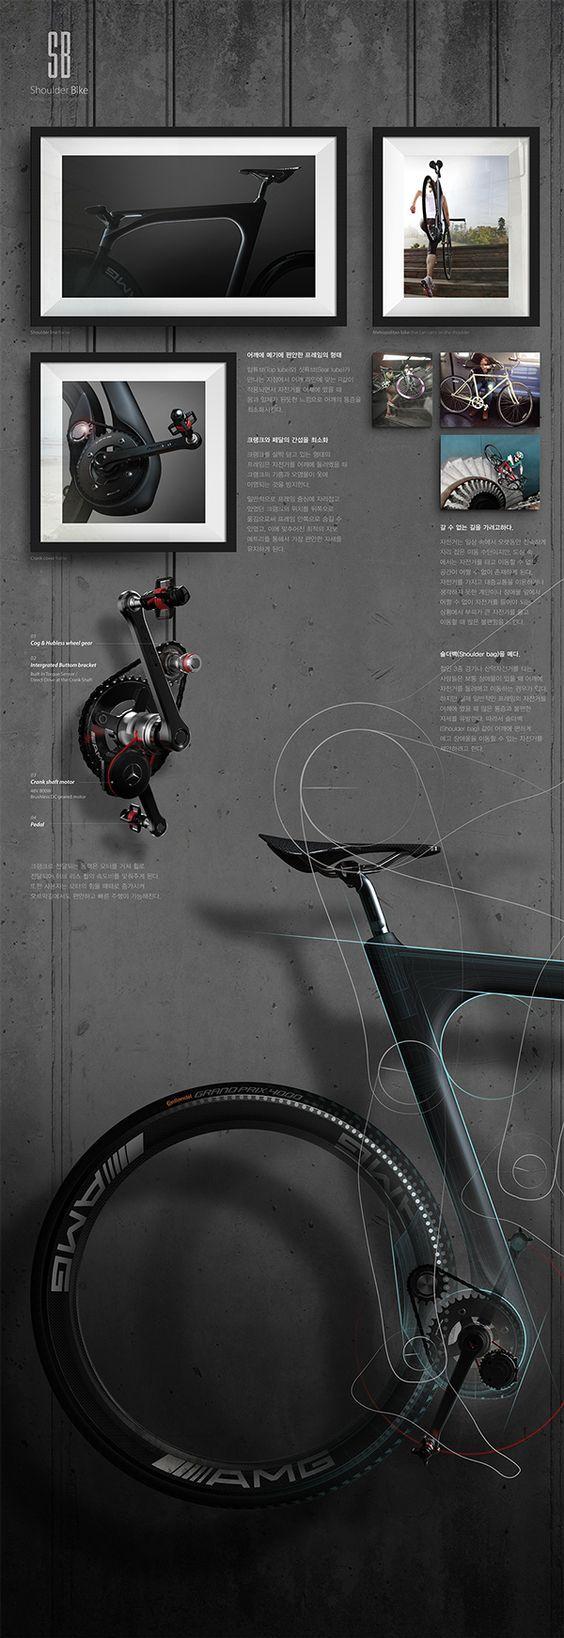 Shoulder Bike Web Design | Fivestar Branding – Design and Branding Agency & Inspiration Gallery